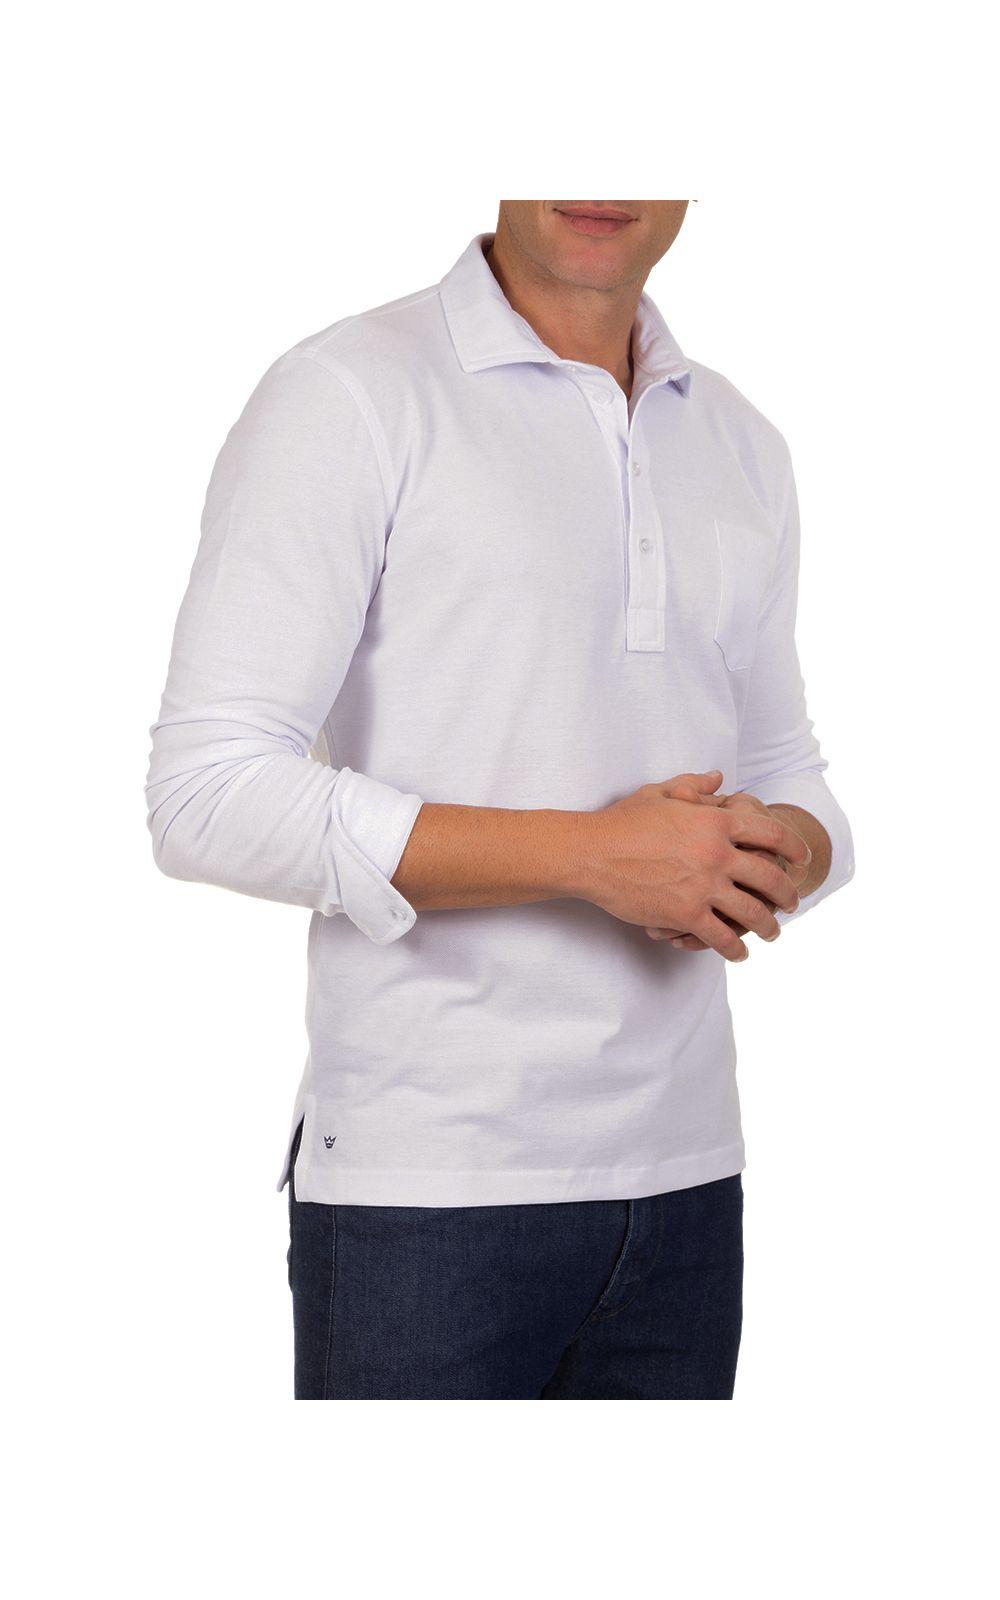 c93349b2fd Camisa Polo Masculina Branca Lisa